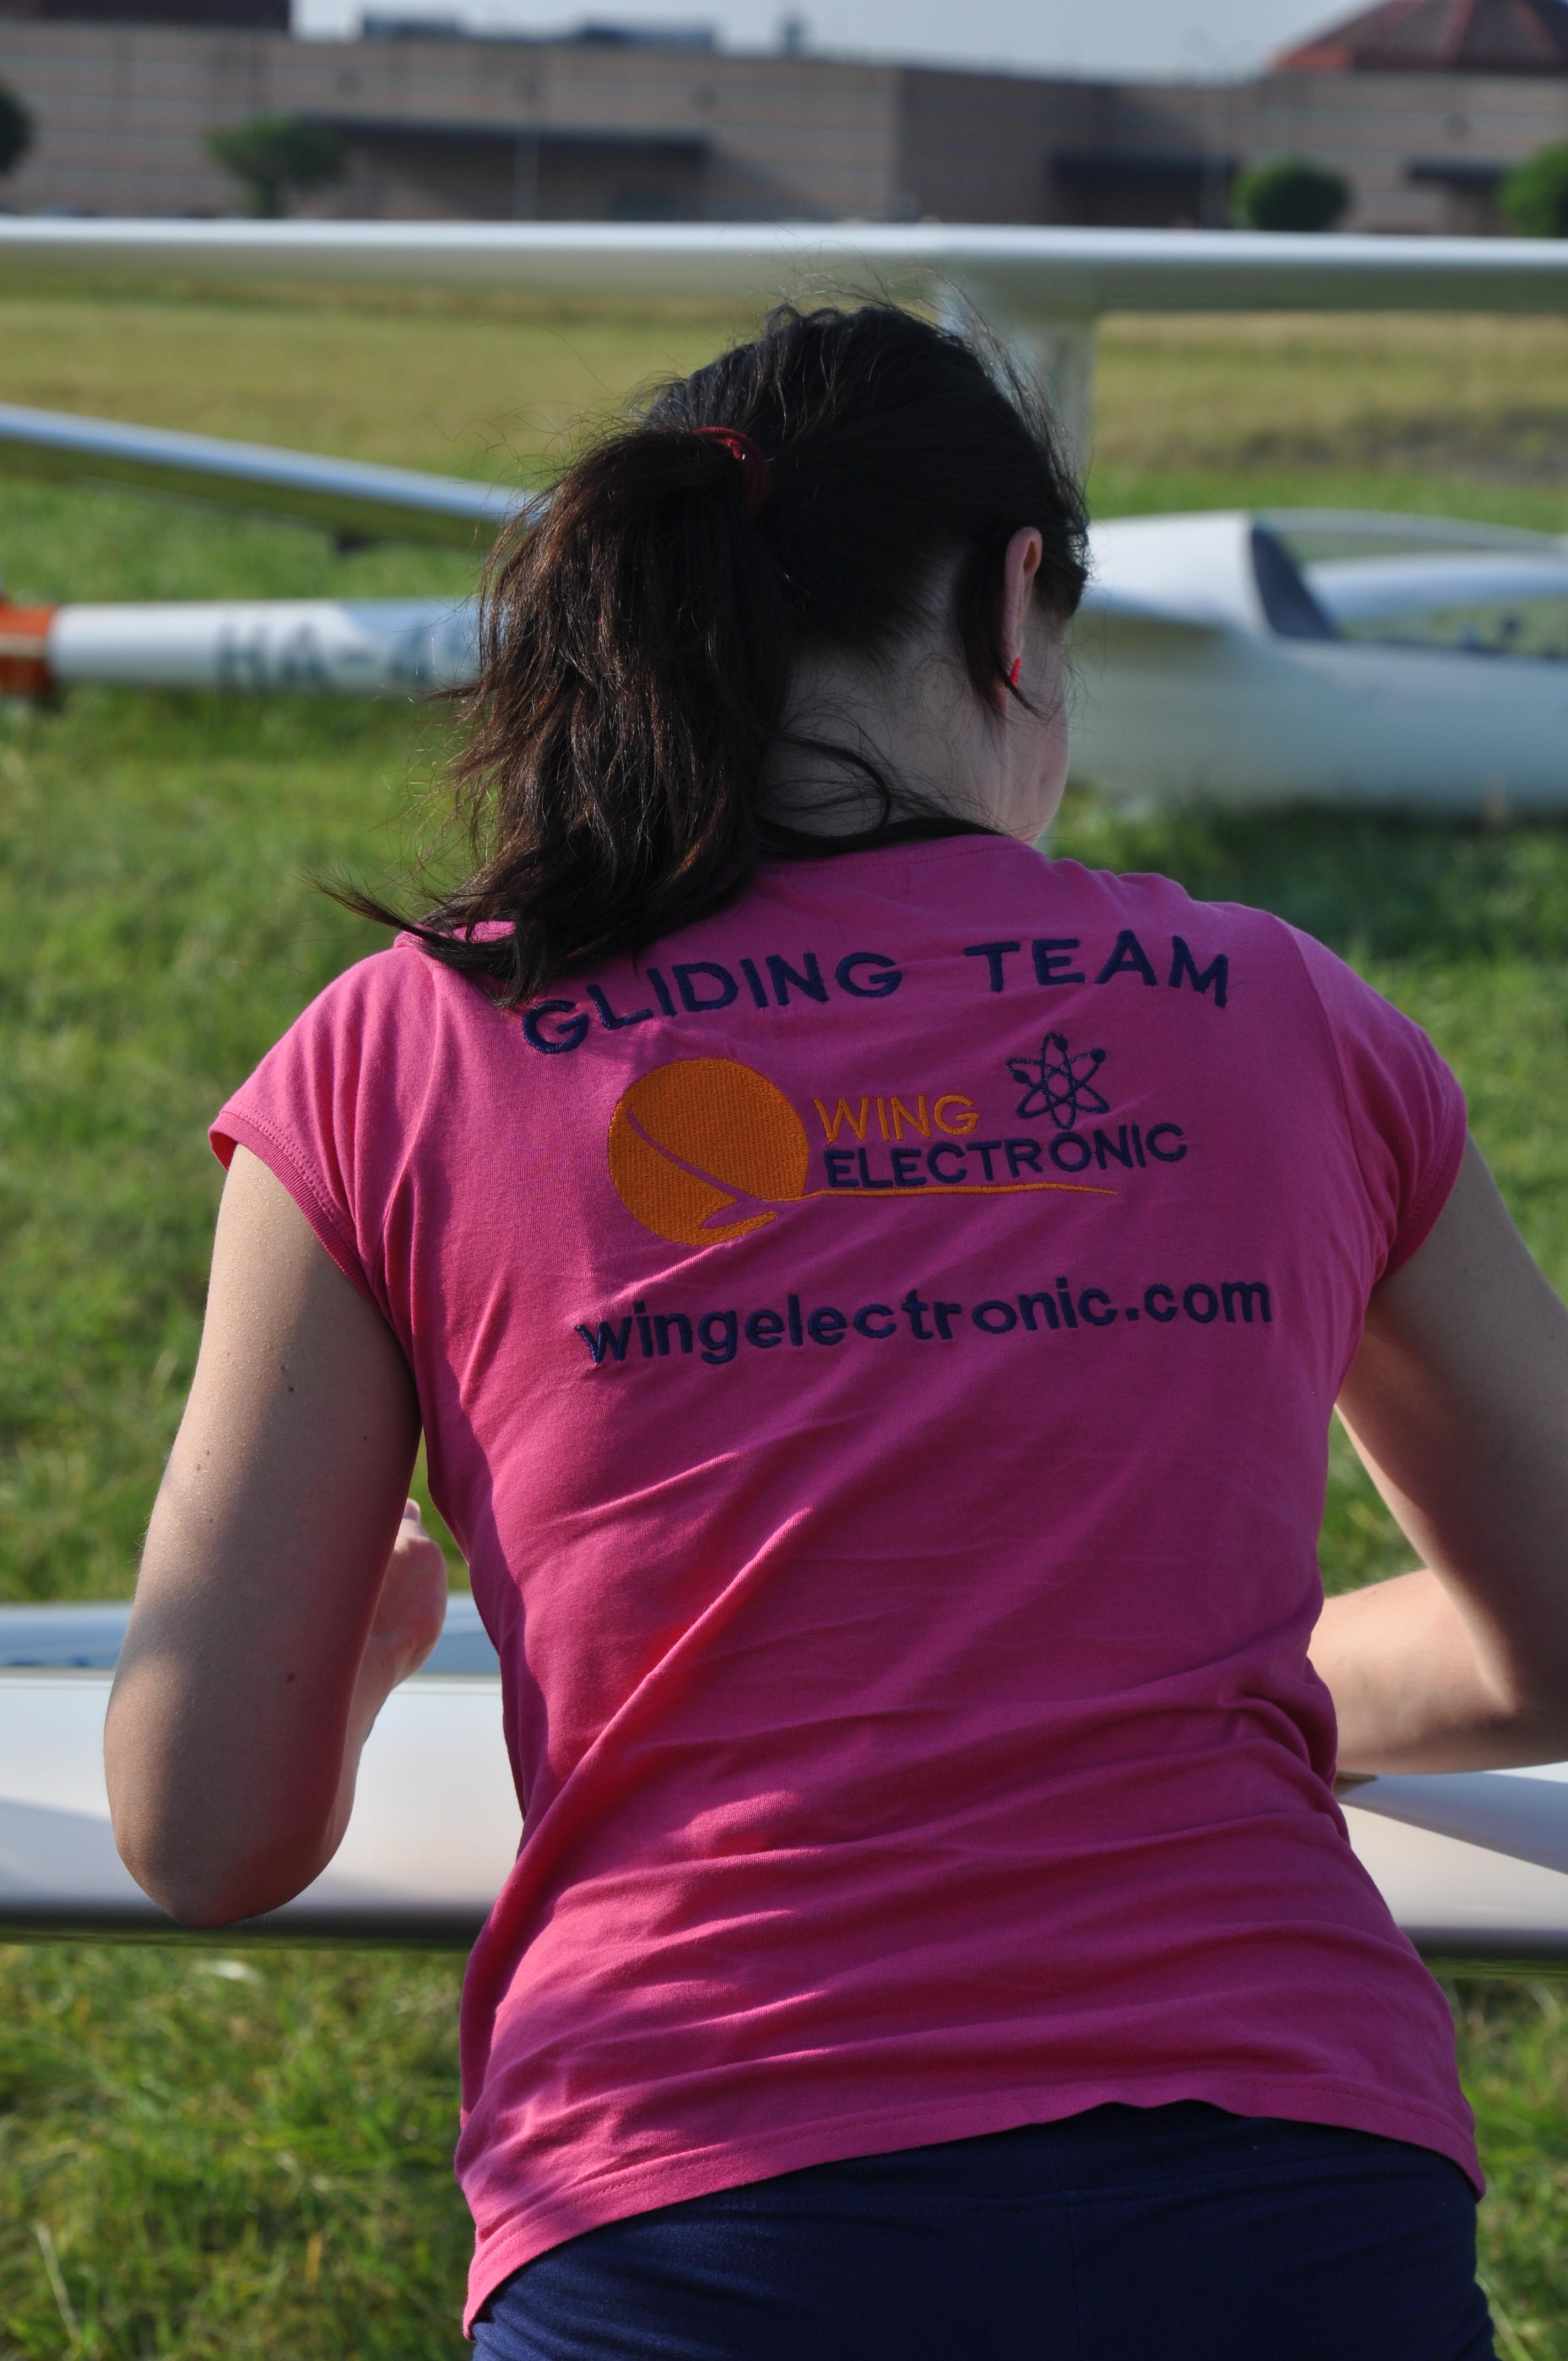 Wing Electronic Gliding Team - Monika